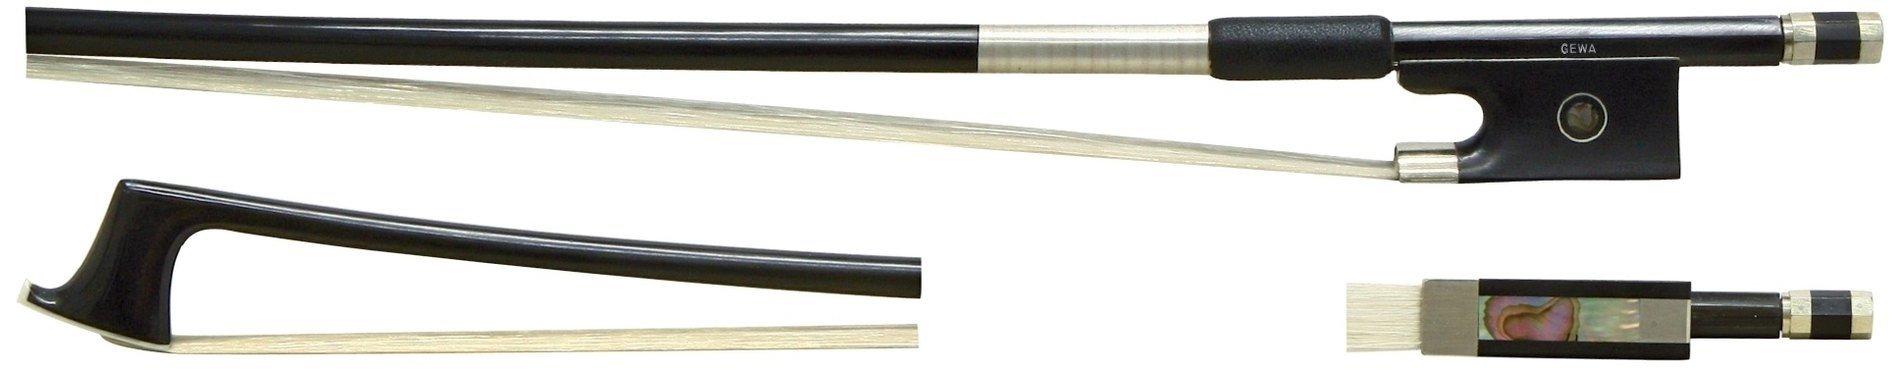 Gewa Carbon Violin Bow